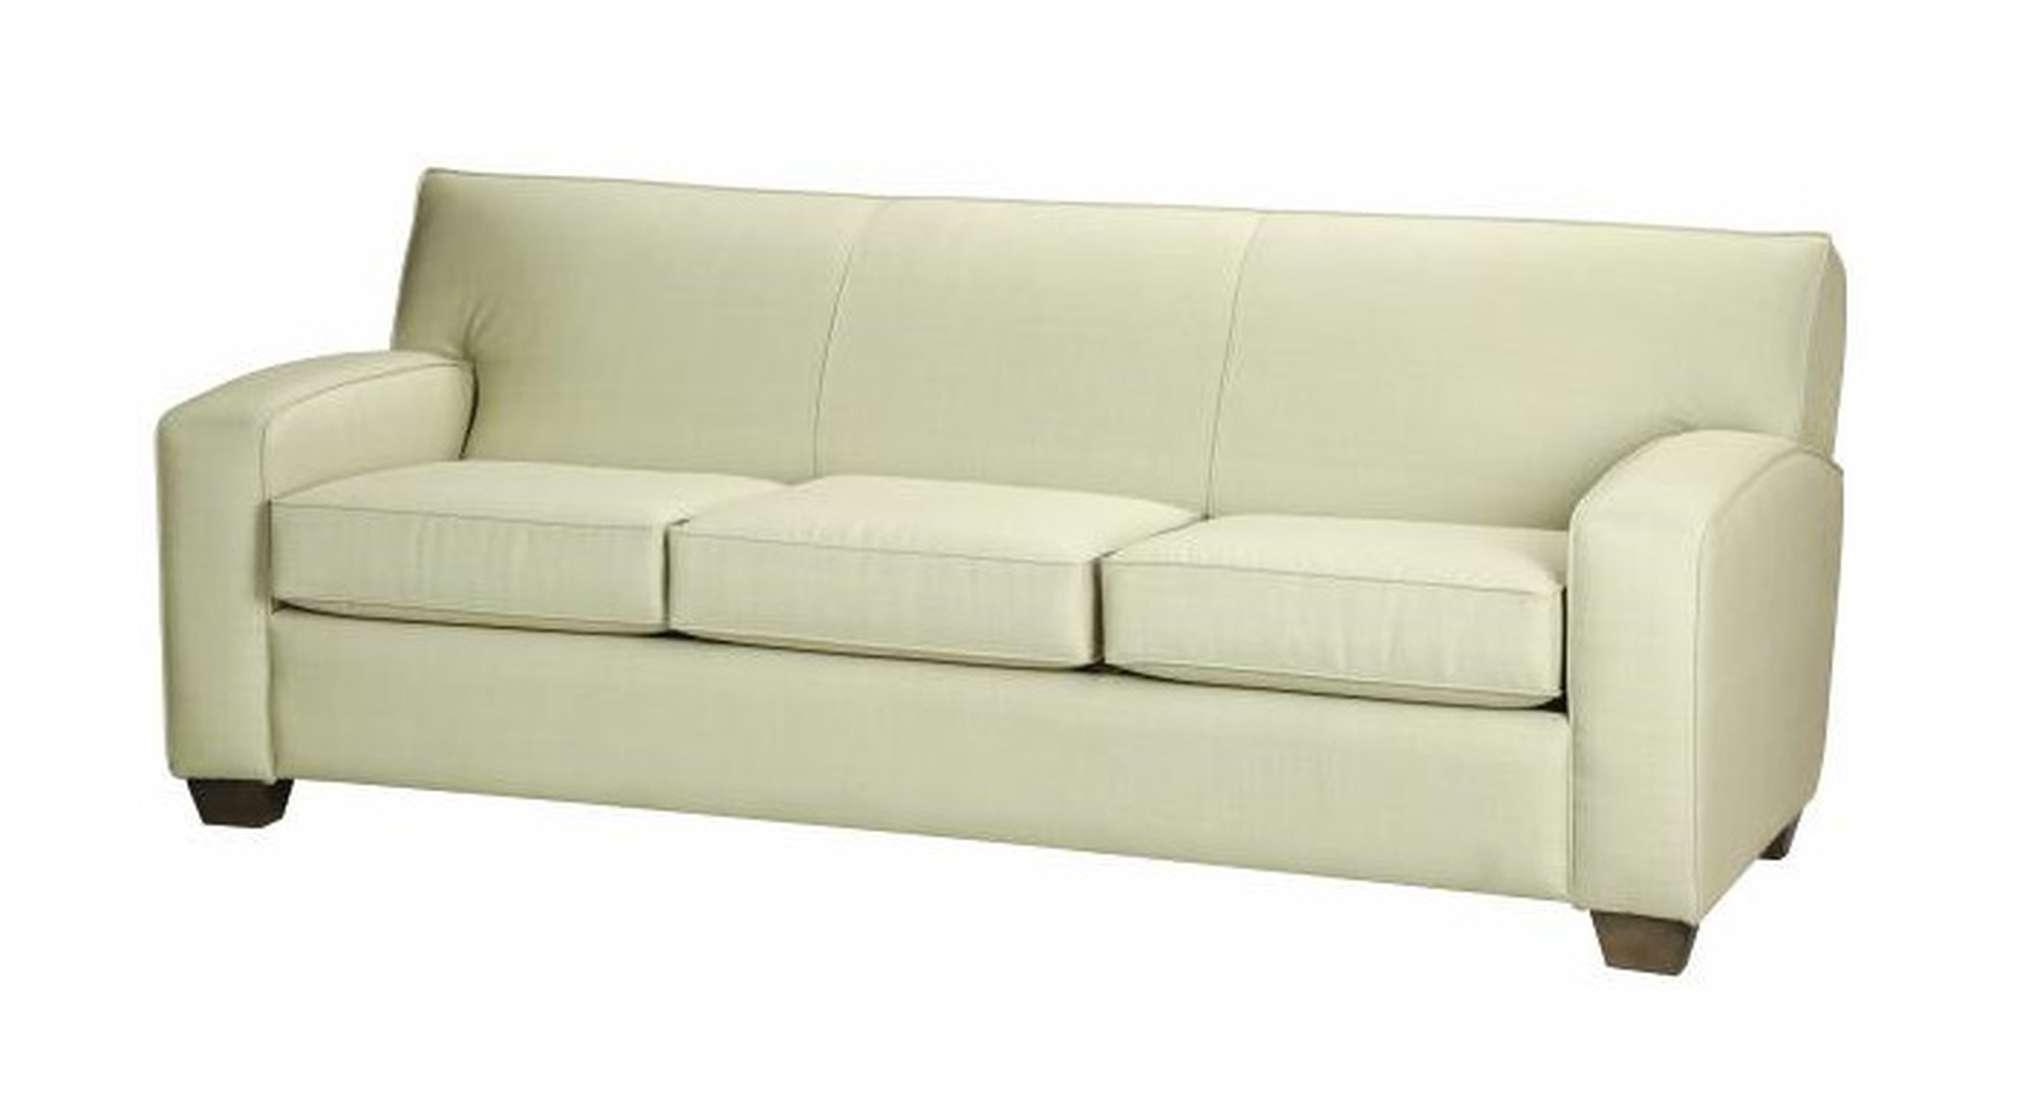 Stupendous Galveston Sofa Maxwell Thomas Unemploymentrelief Wooden Chair Designs For Living Room Unemploymentrelieforg